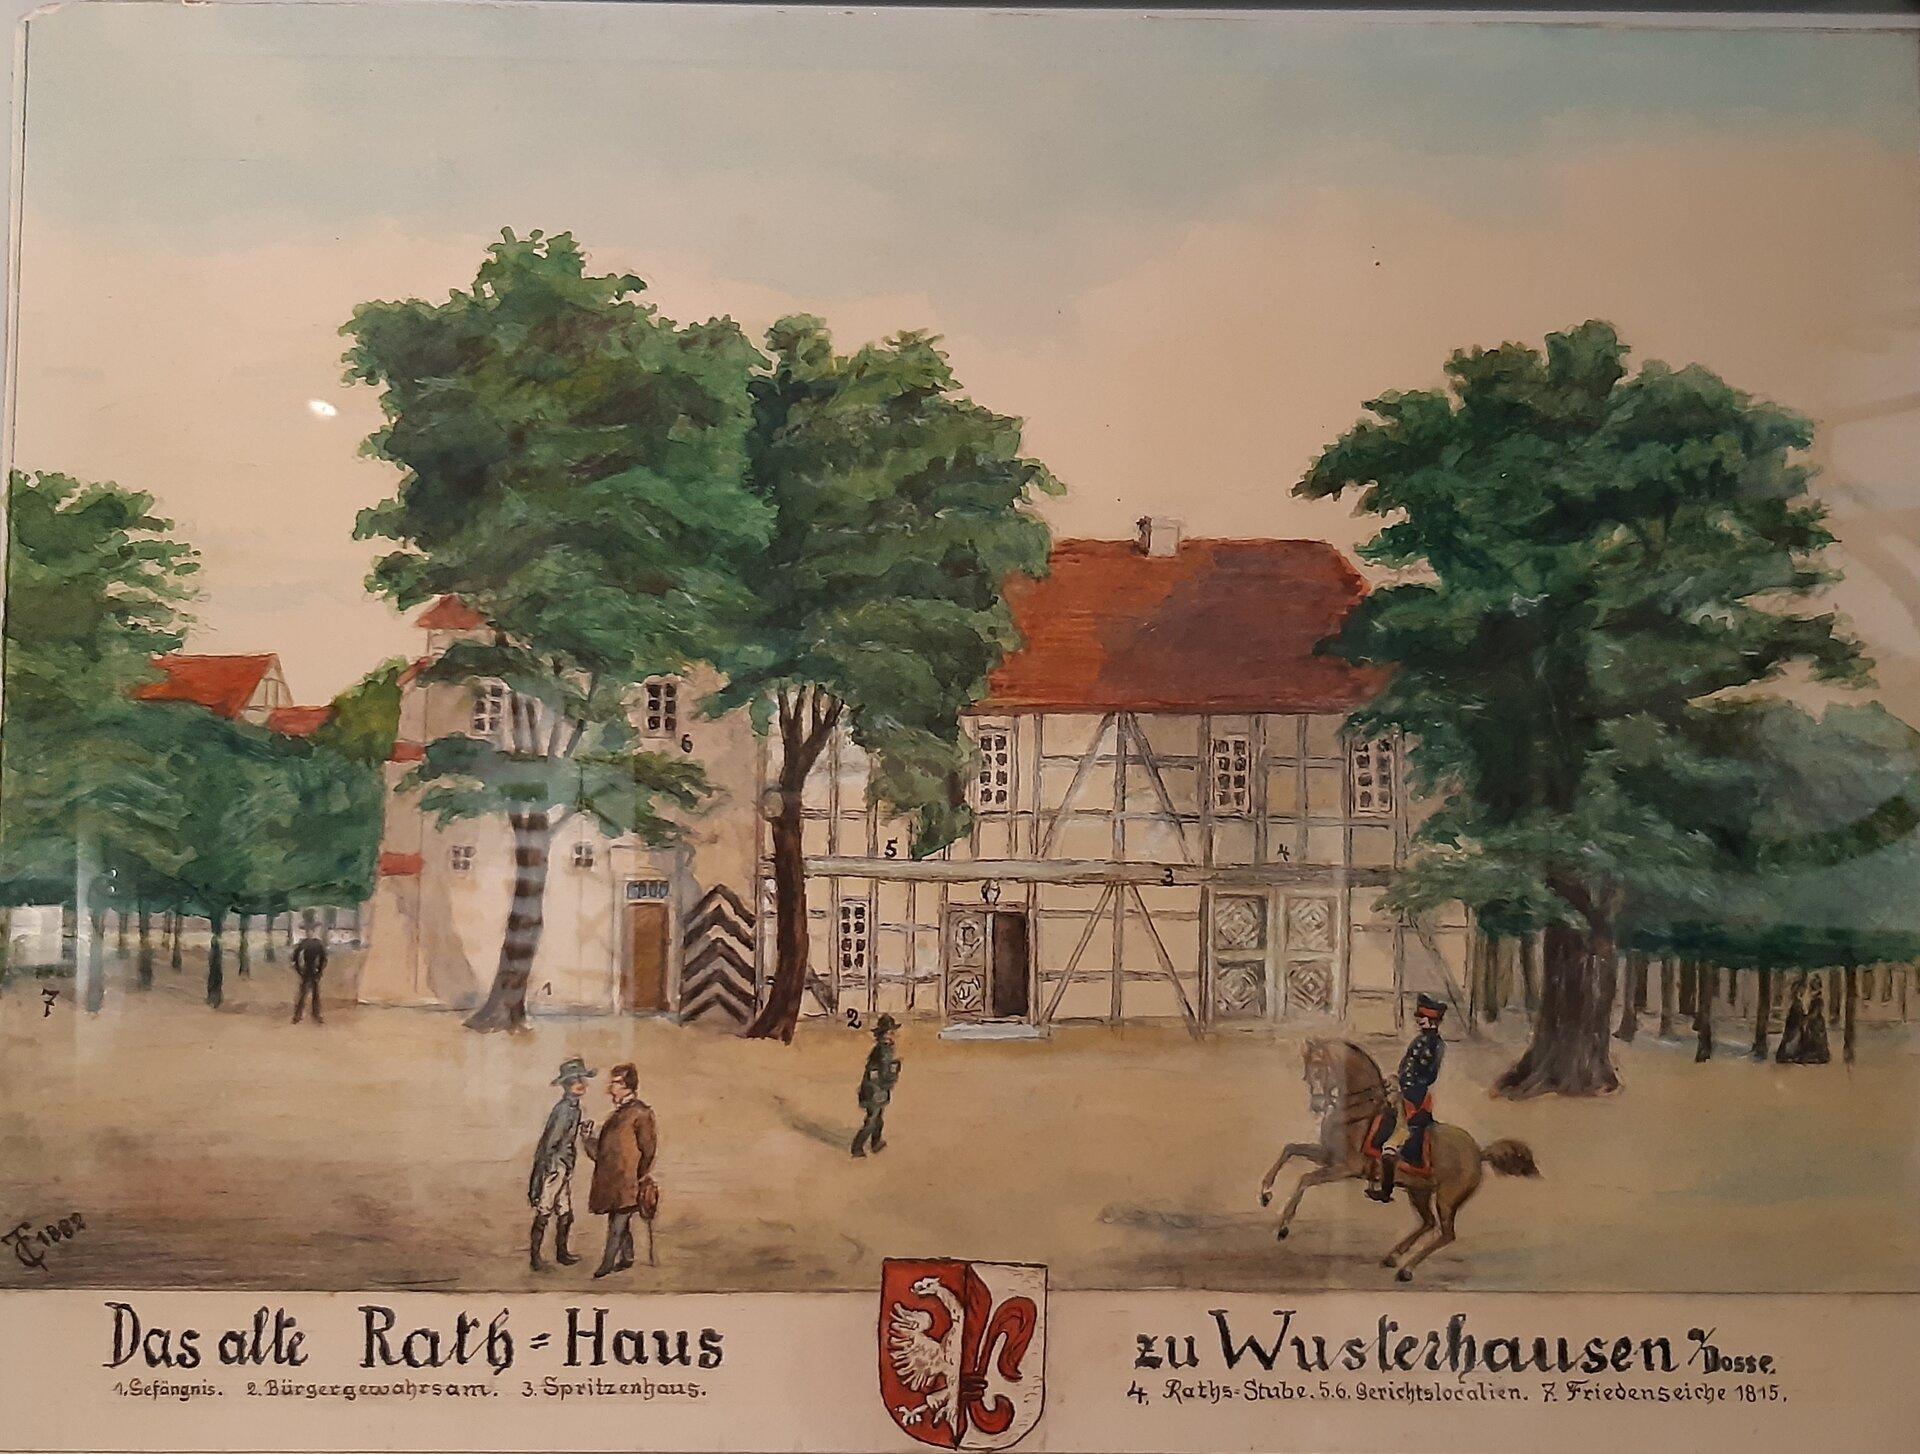 Das alte Rathaus Quelle: Archiv Wegemuseum/ Th. Dombrowski